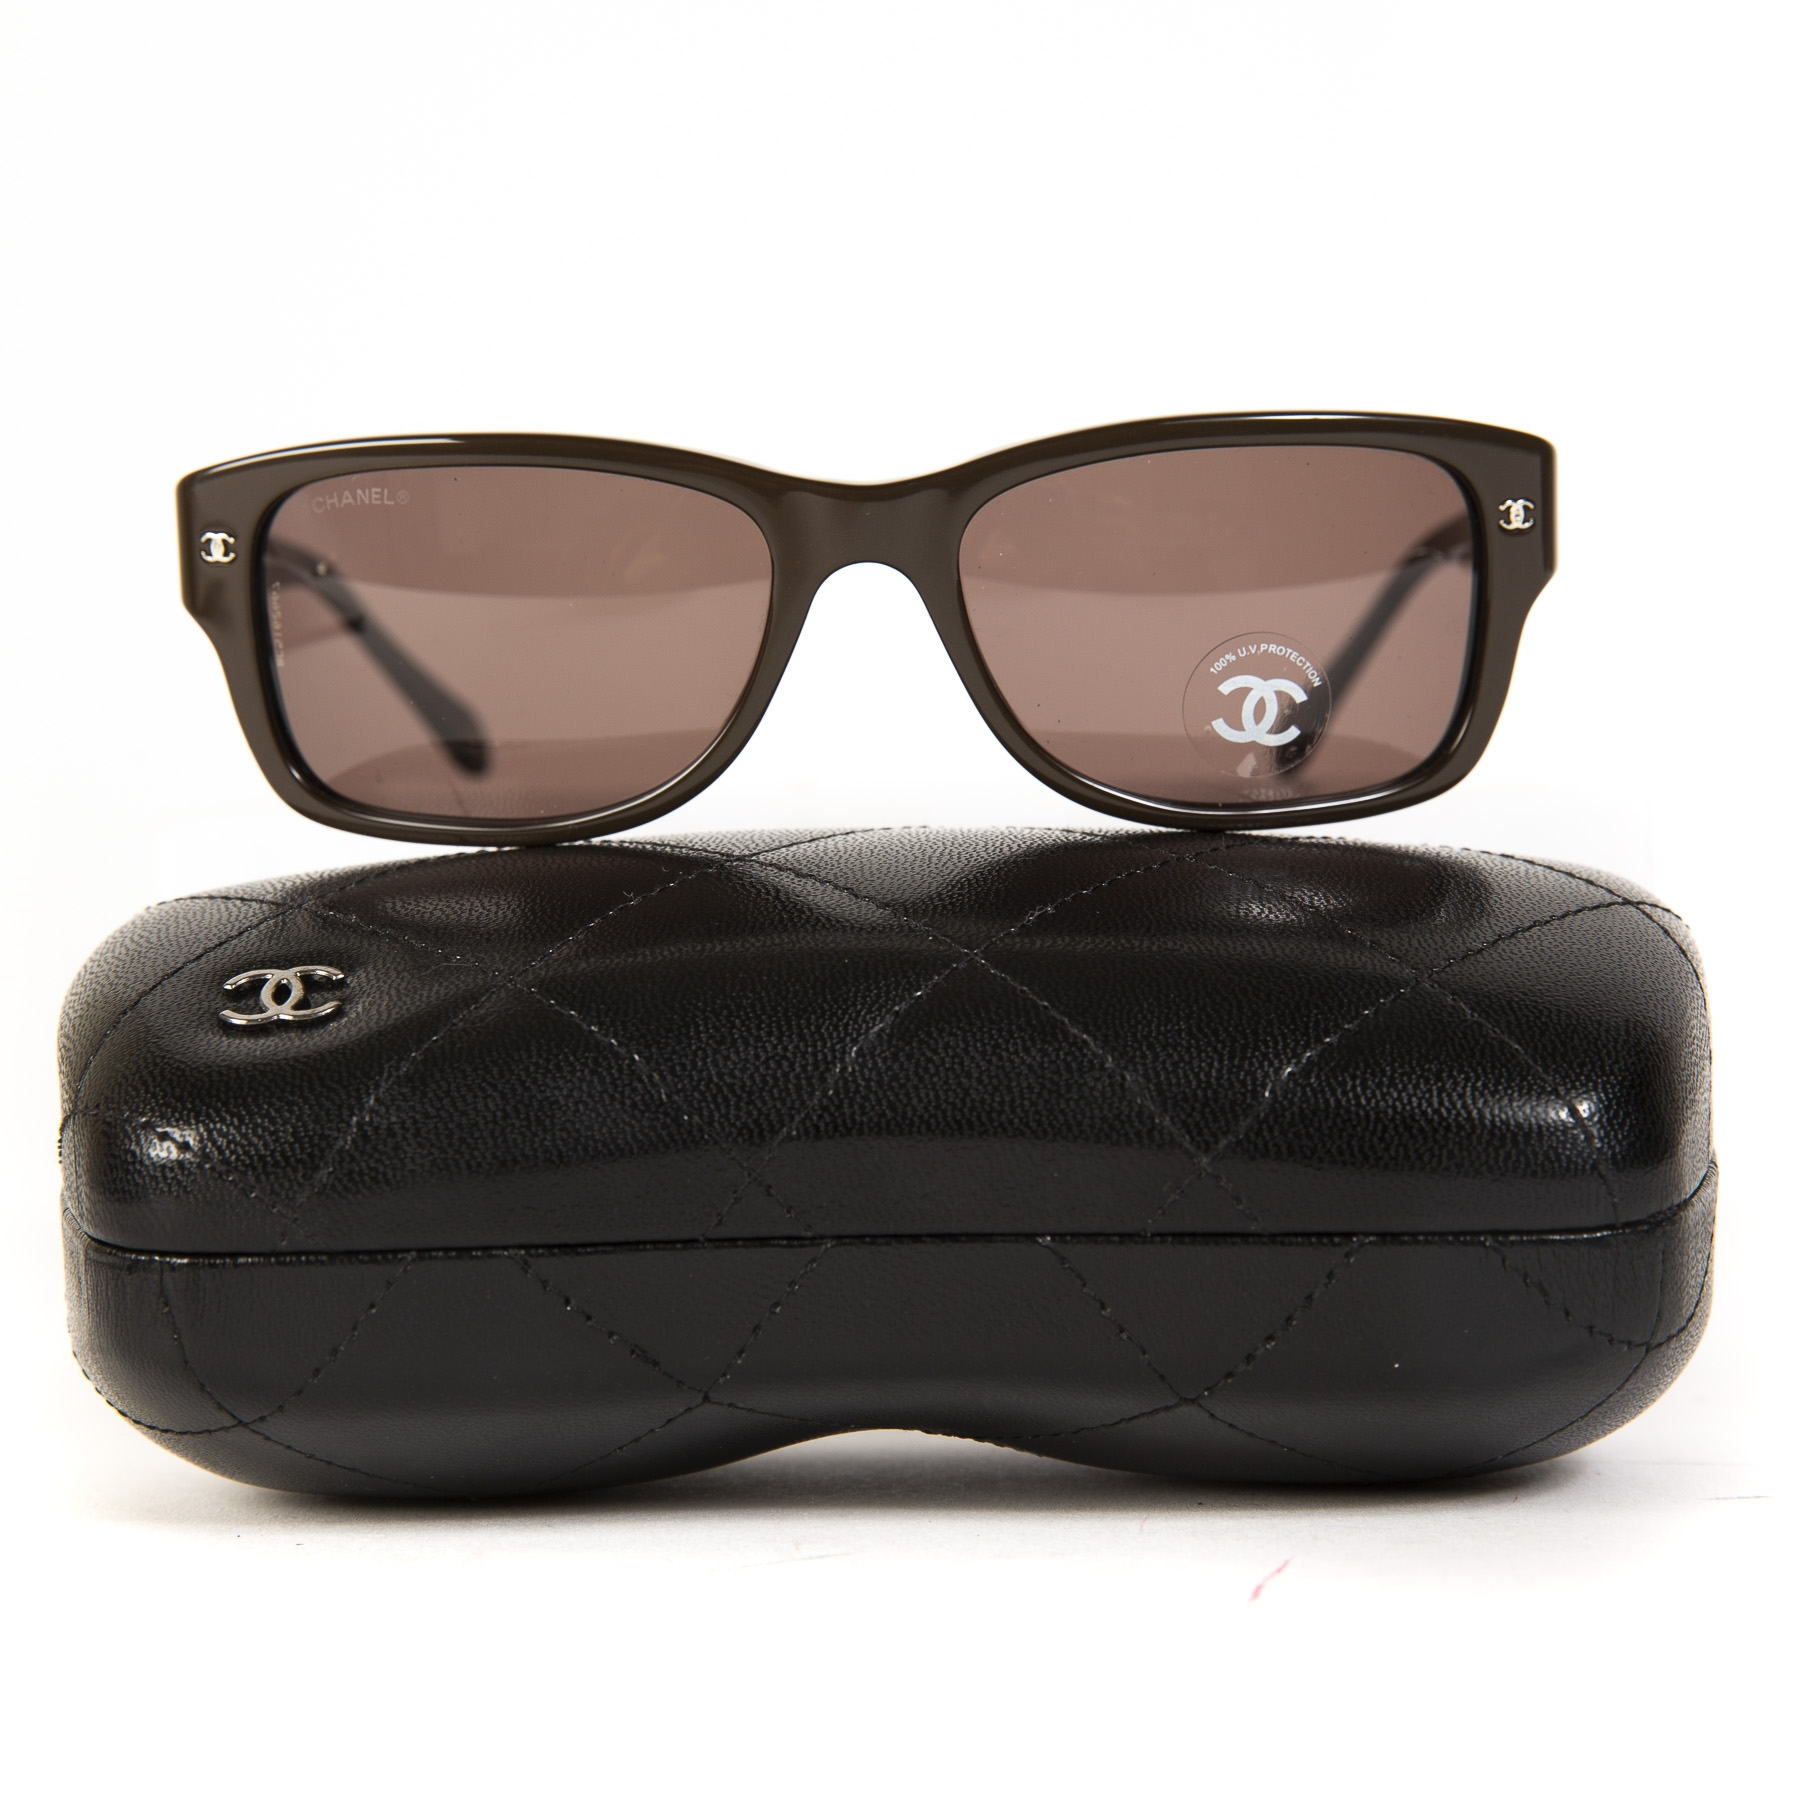 Chanel Rectangle Burgundy Brown Gradient Sunglasses